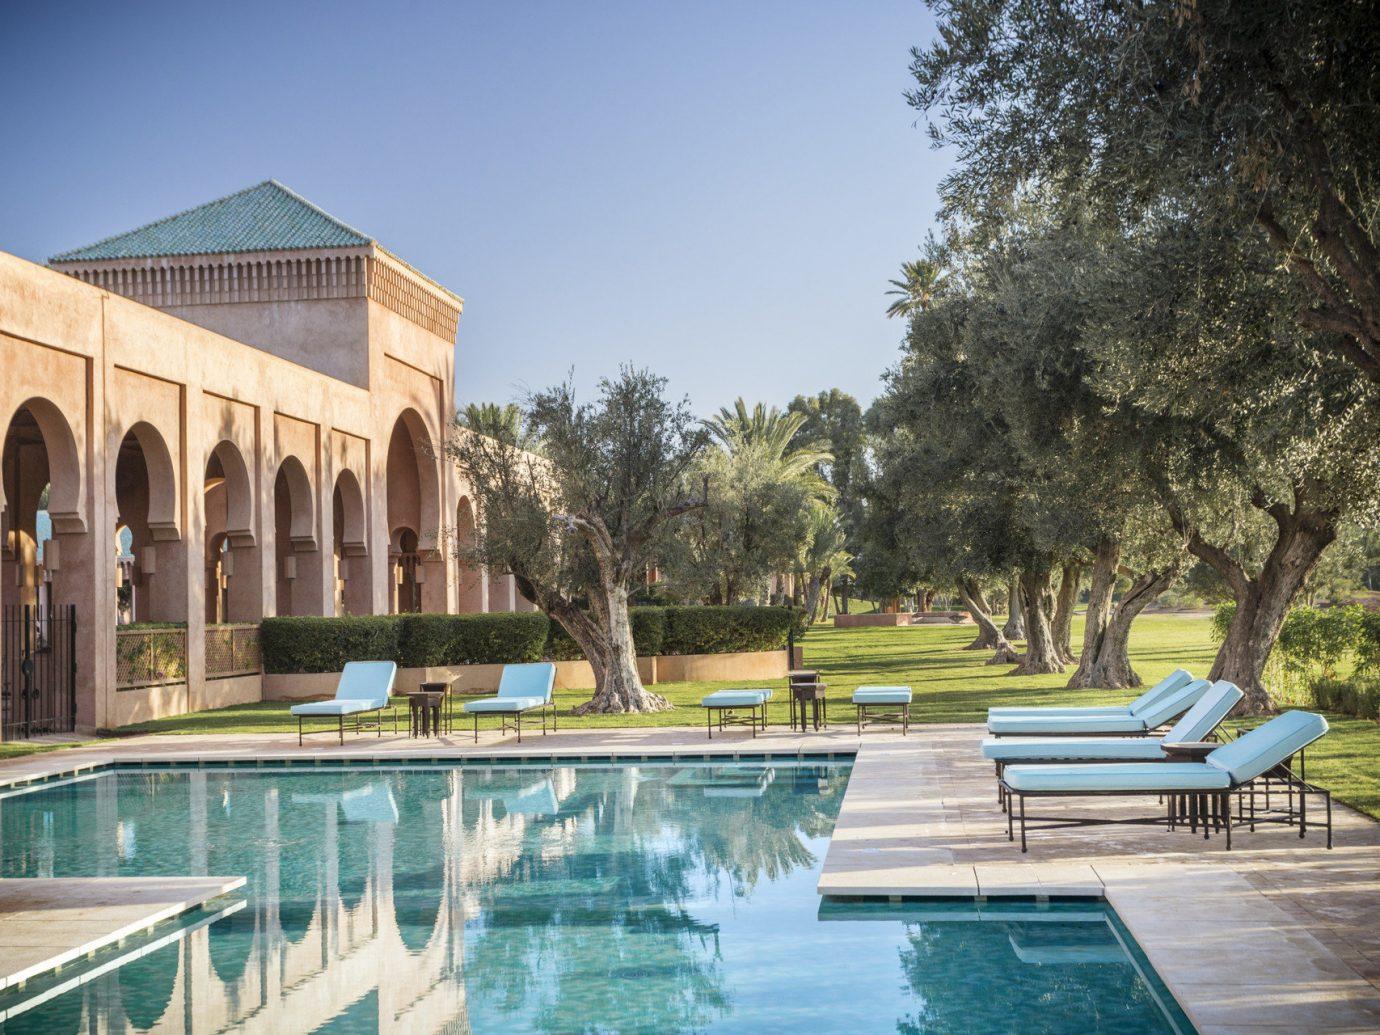 Hotels outdoor building leisure property swimming pool estate vacation reflecting pool bridge Villa palace mansion Resort backyard